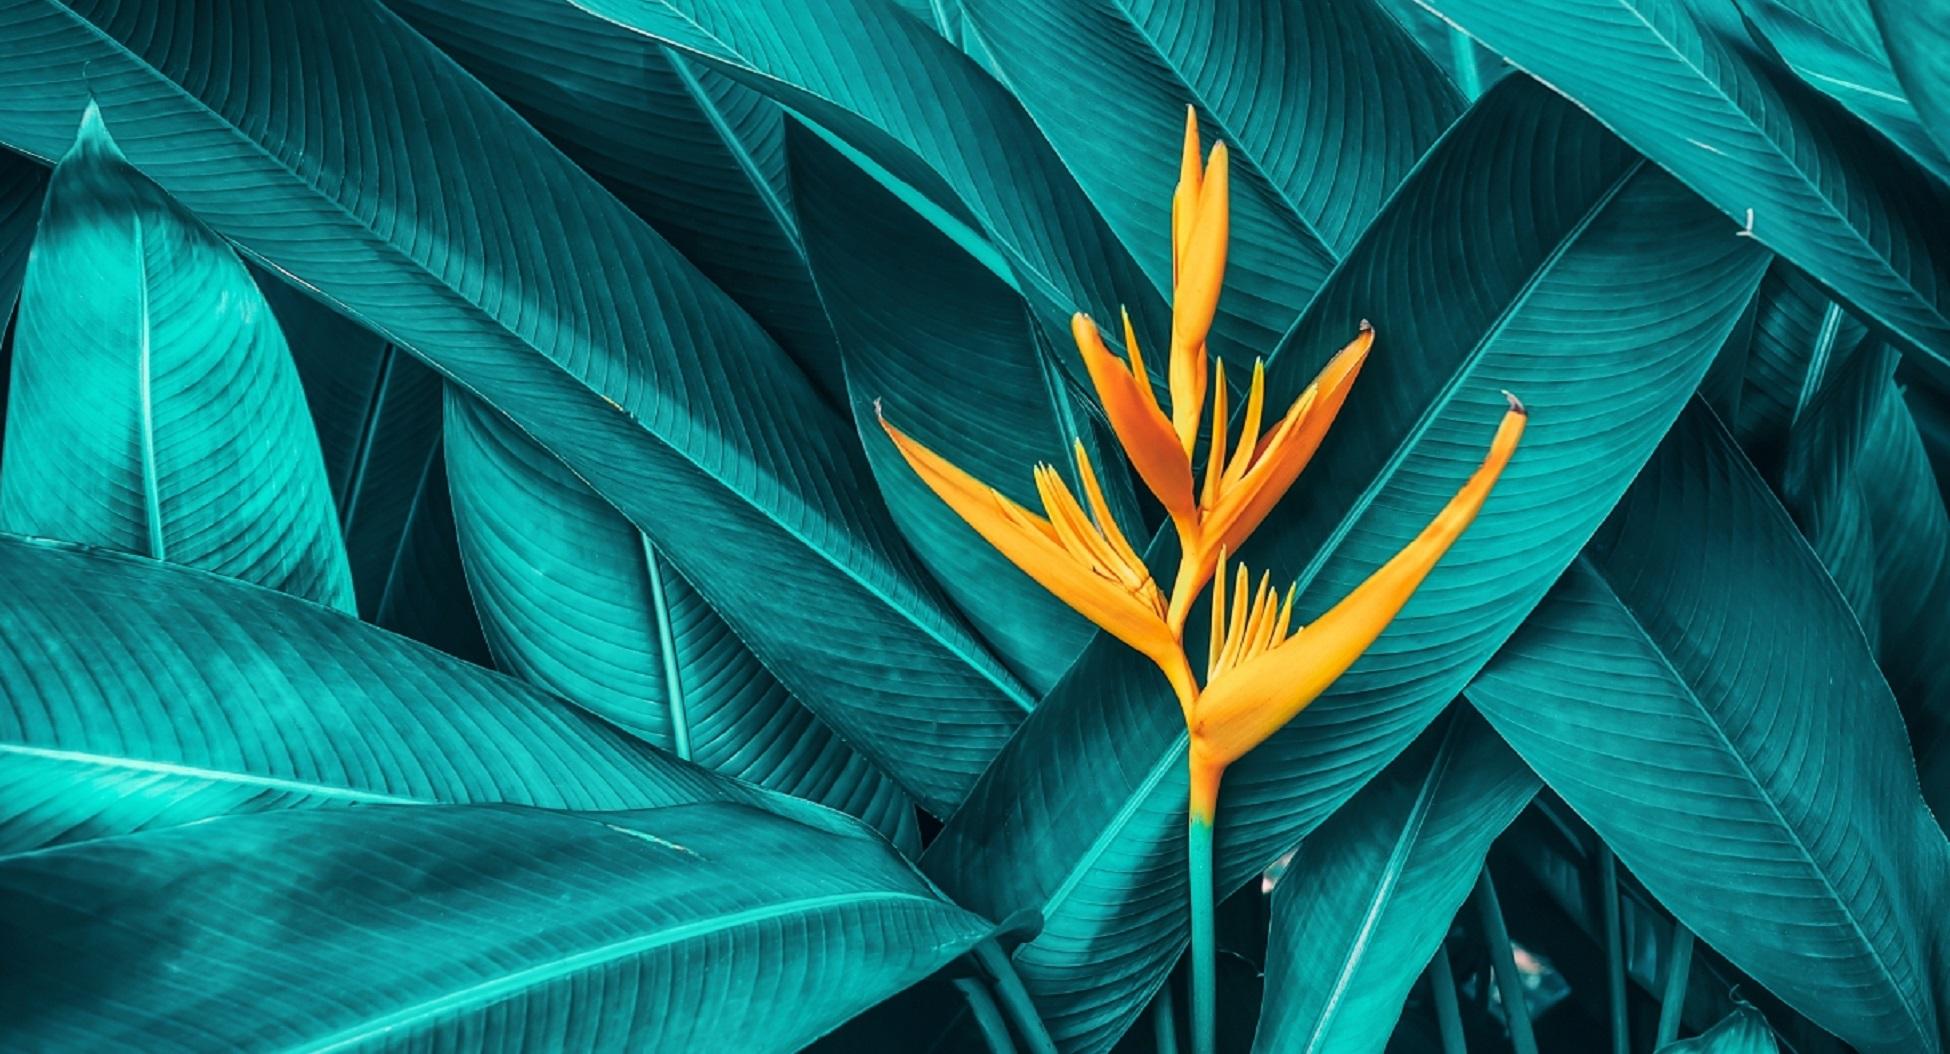 Divers Nature Fleur Gros plan Detail Vert Jaune S721703848 crop